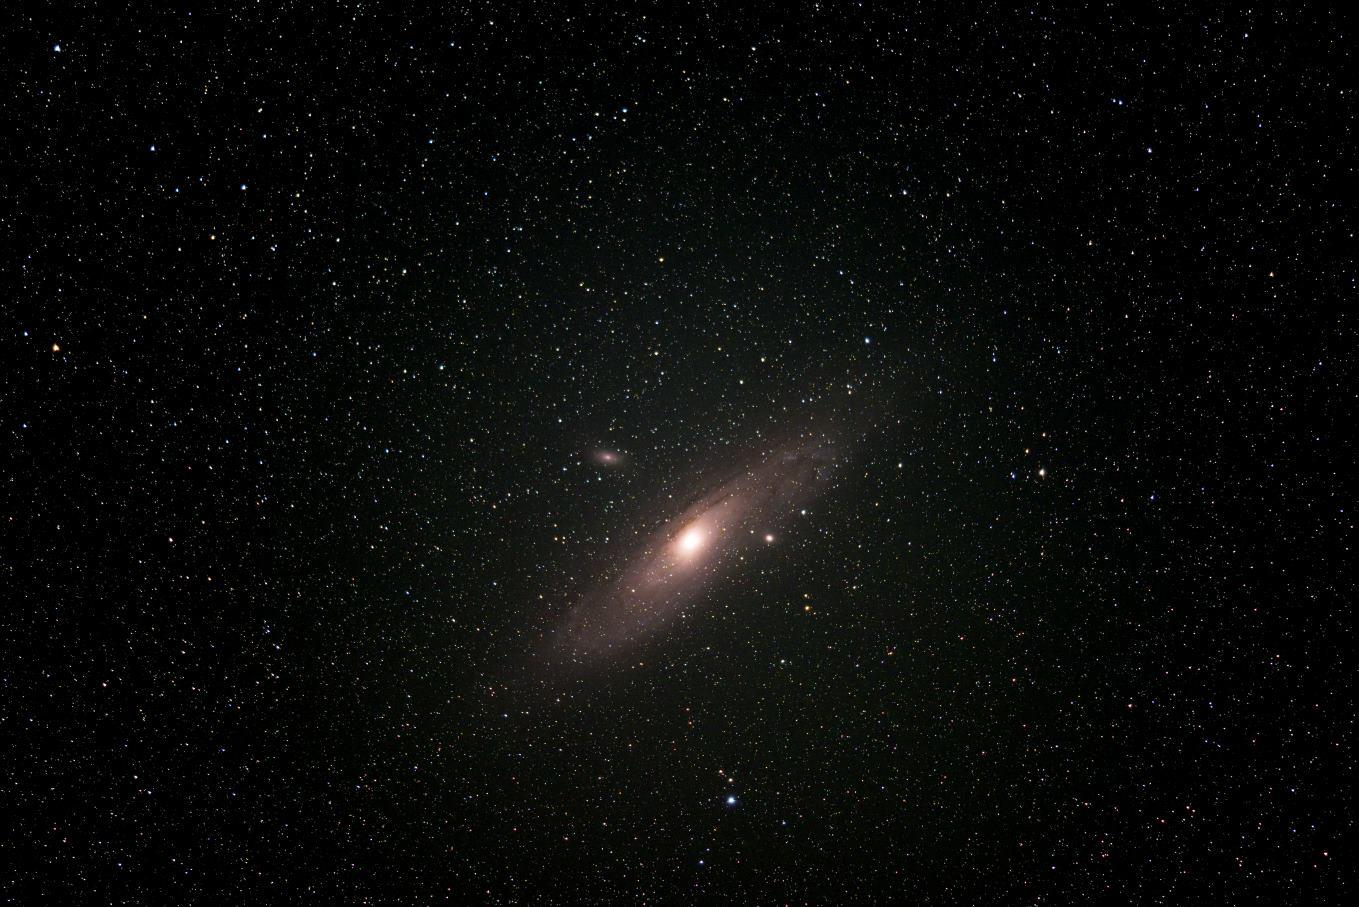 Andromeda Galaxy (M31) by Redfern